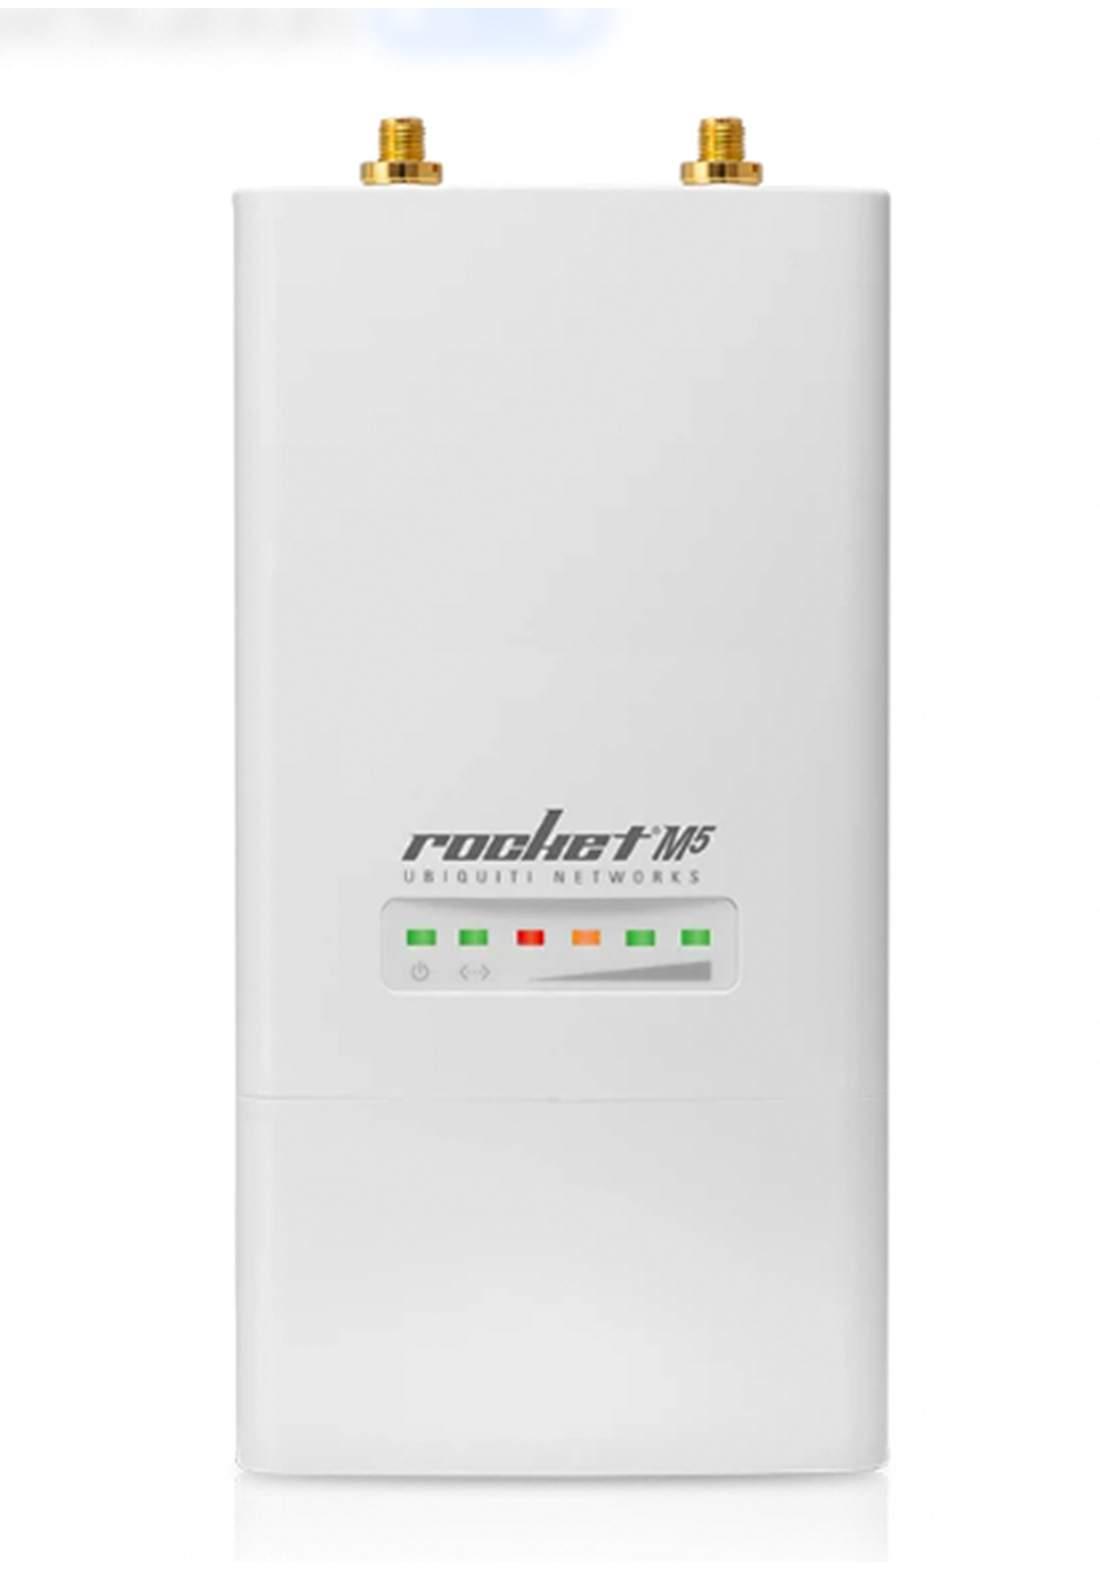 Ubiquiti Networks AirMAX RocketM 5 GHz BaseStation - White